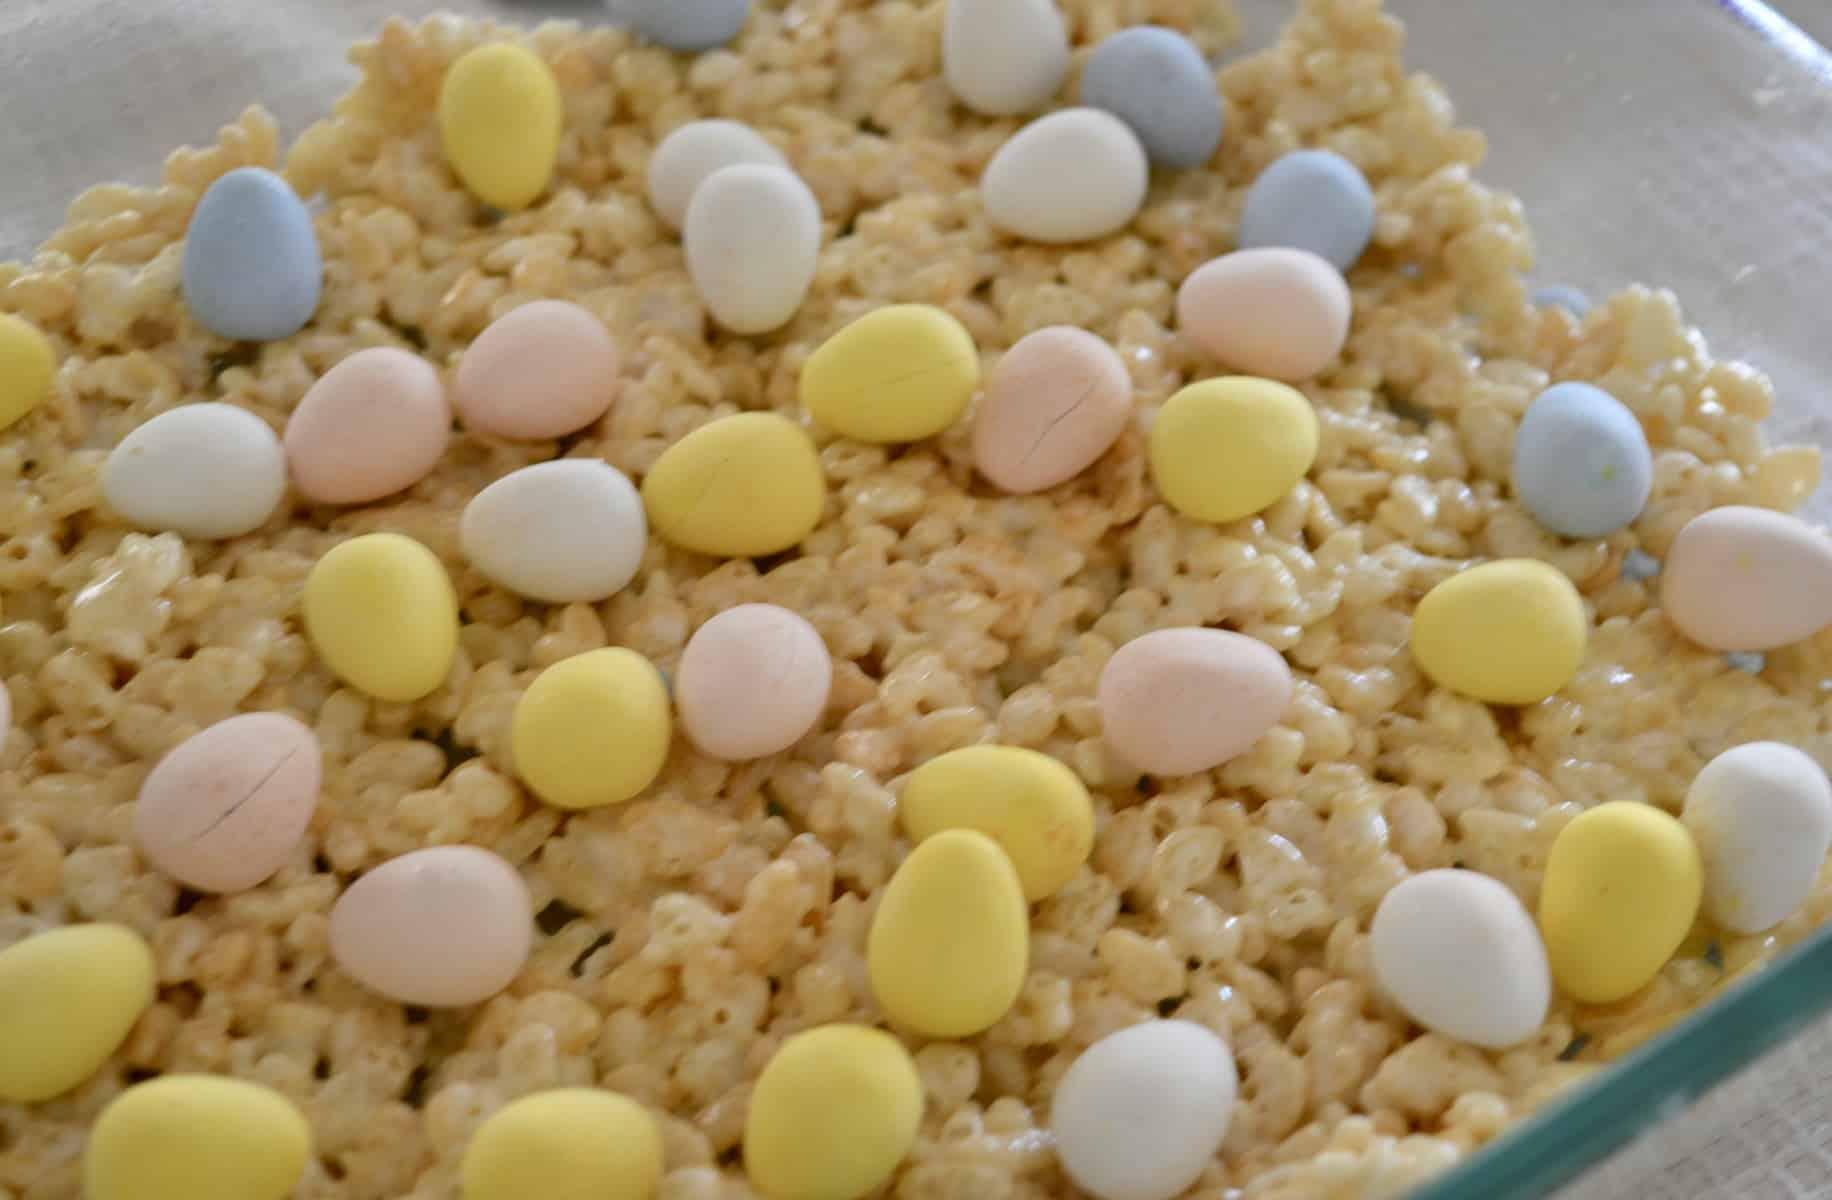 lay the Cadbury mini eggs on top of the treats